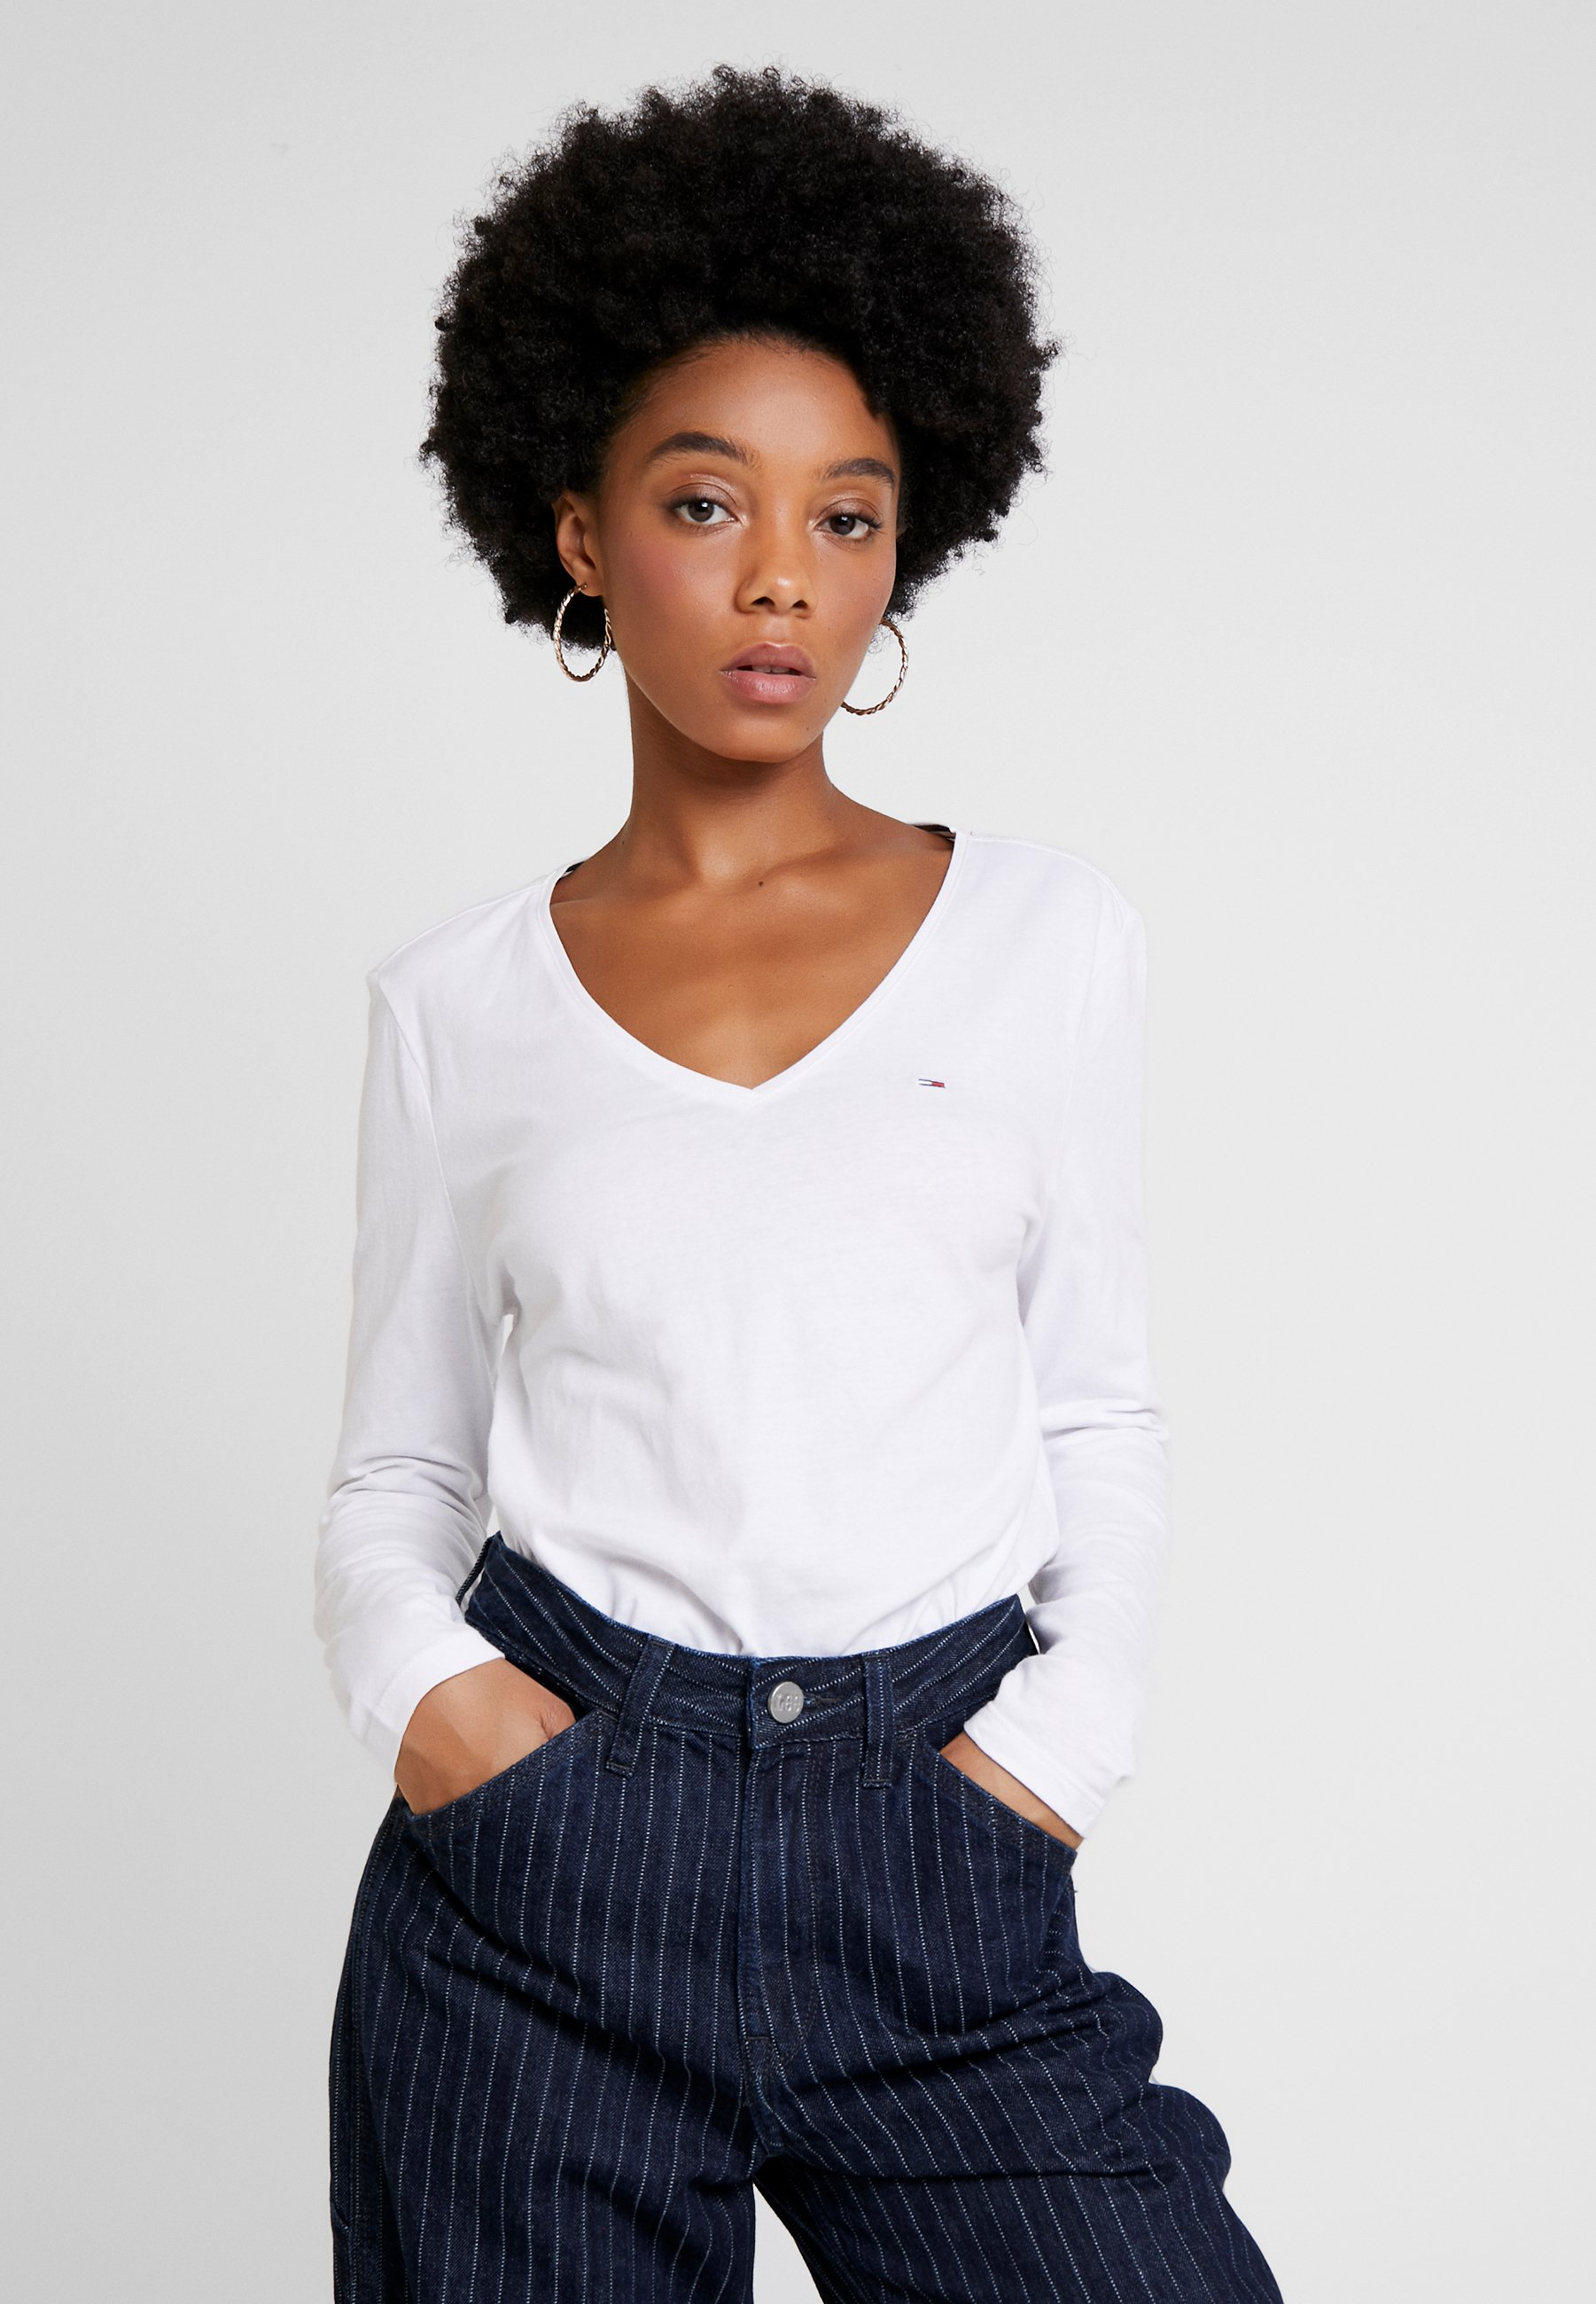 Classic Neck Jeans Soft shirt Longues Tommy White LongsleeveT V À Manches sdCQxtrh